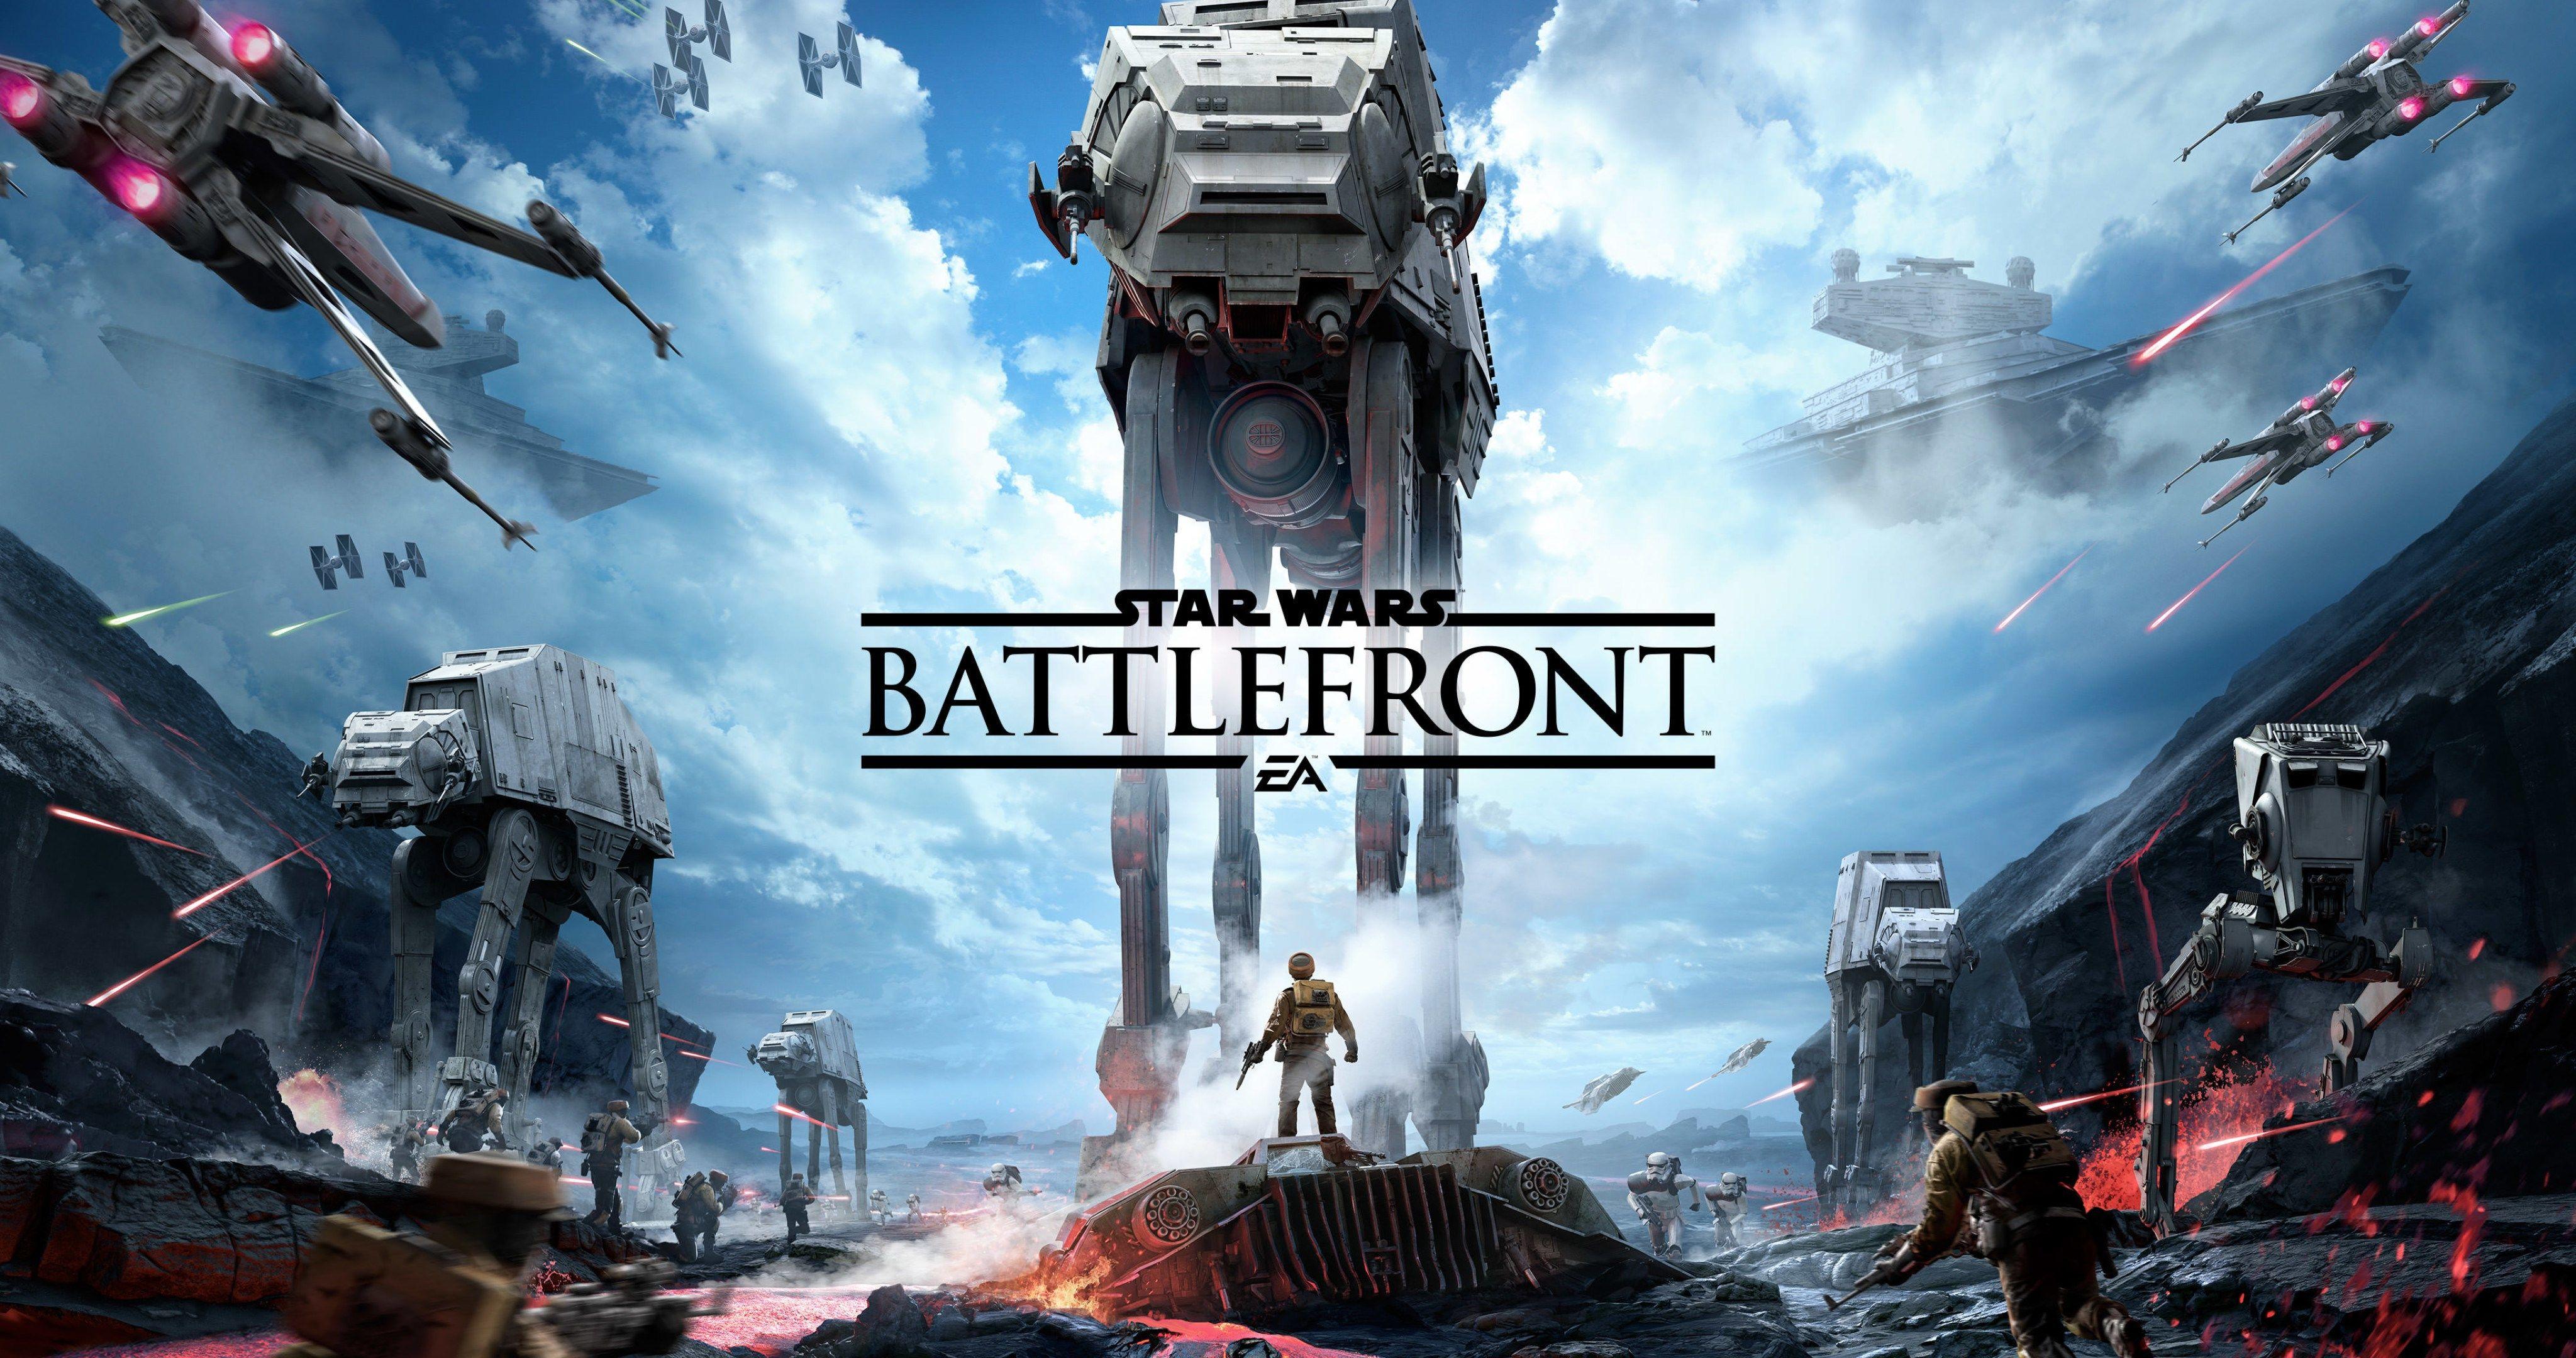 Star Wars Battlefront 4k Ultra Hd Wallpaper Star Wars